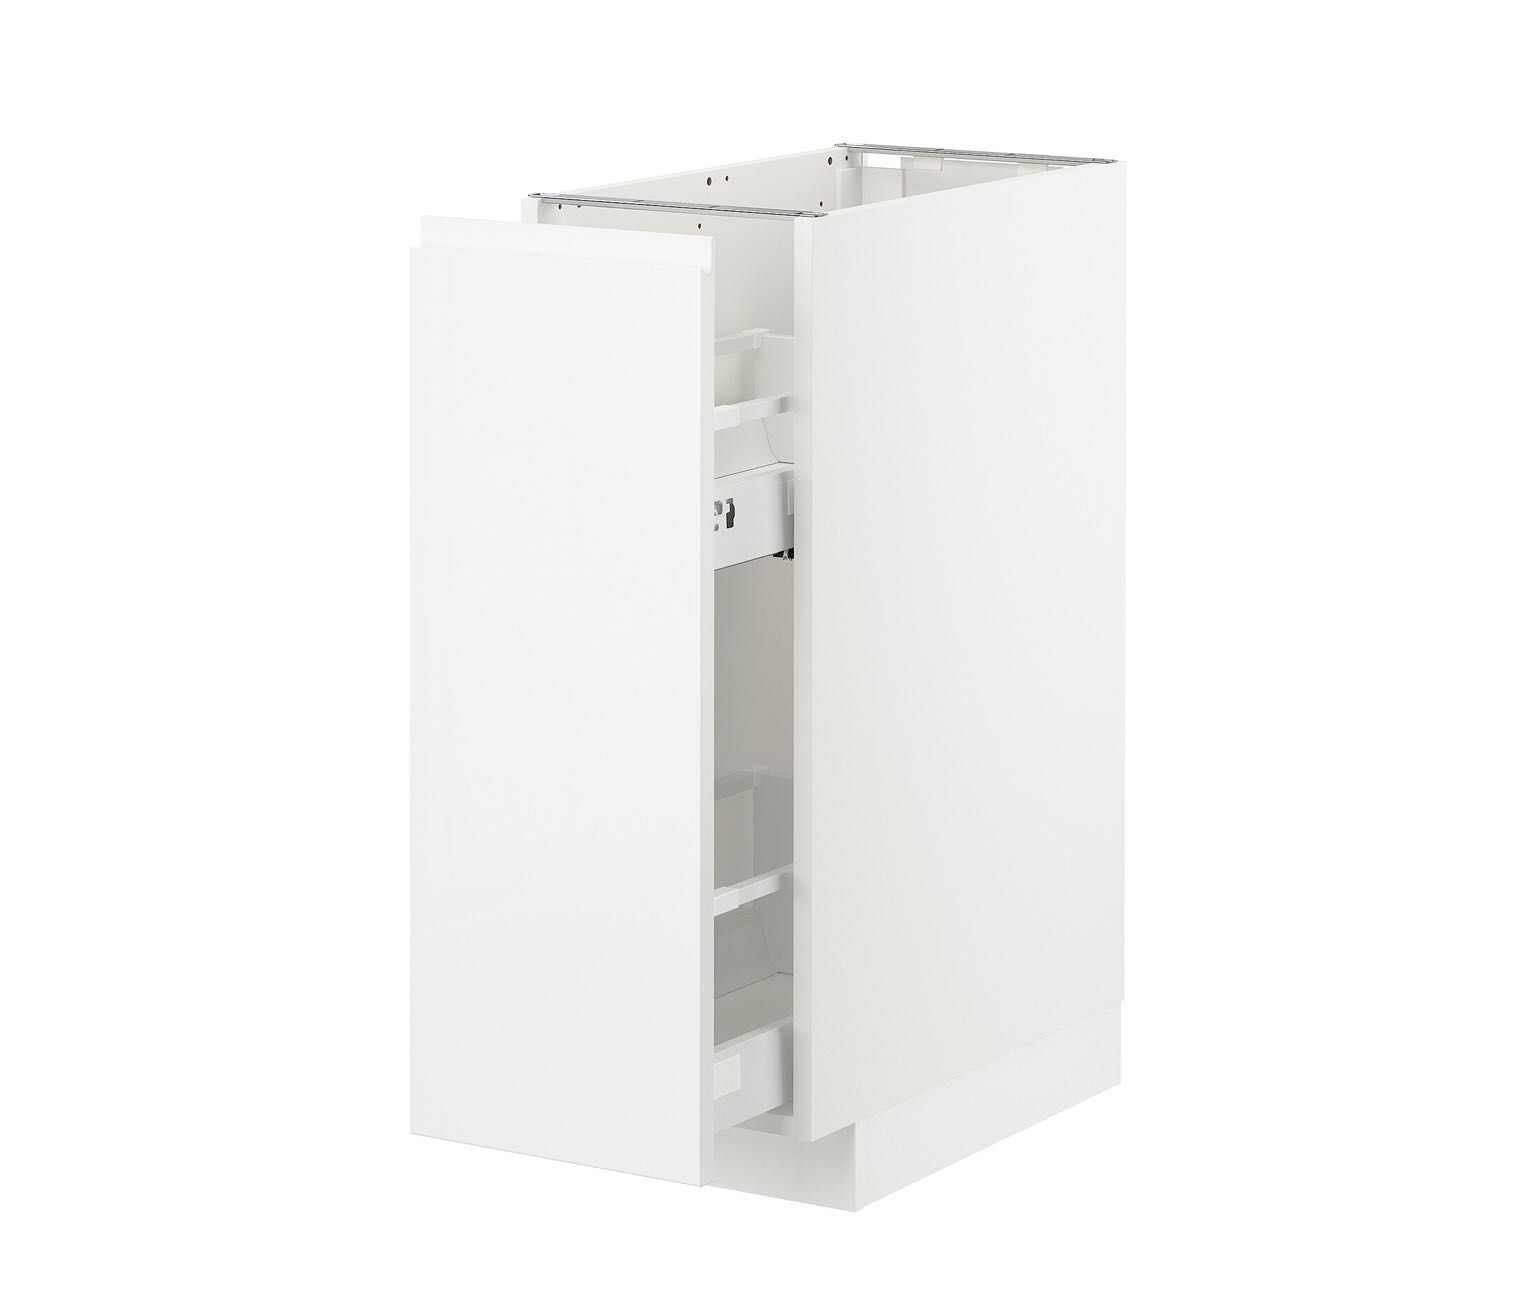 Armario debaixo IKEA - METOD voxtorp branco brilh 30x60